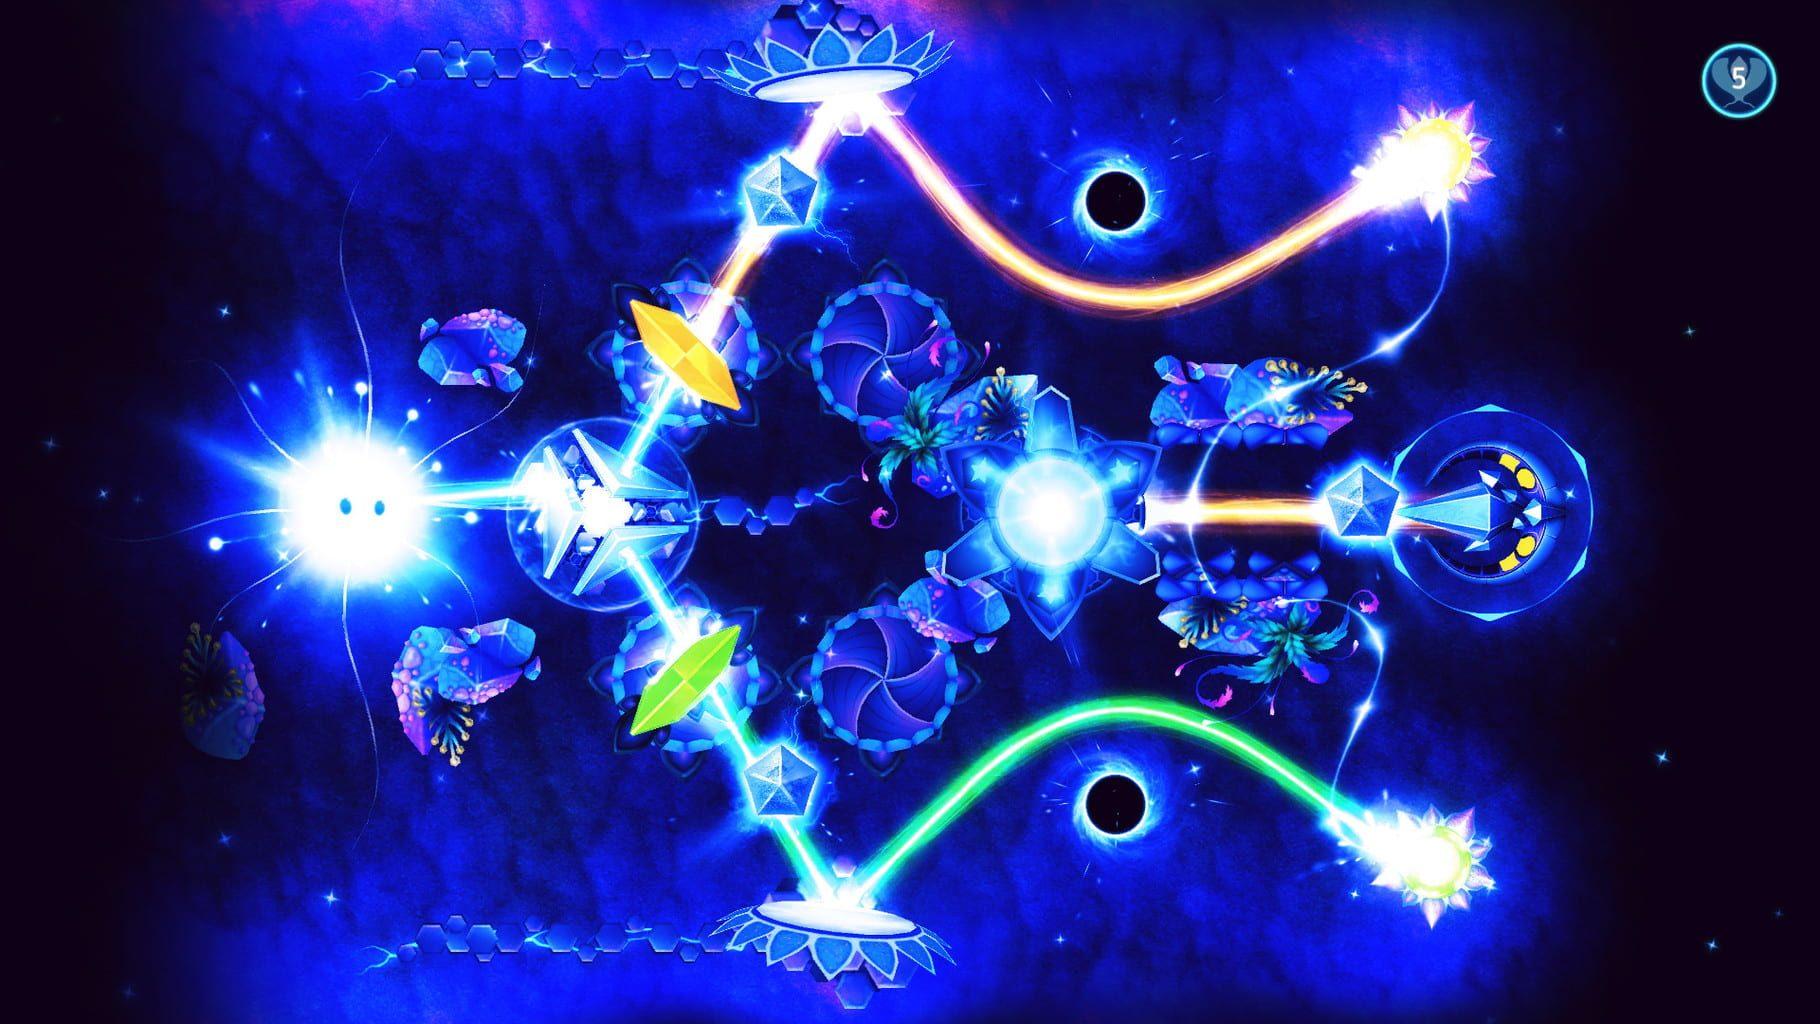 God of Light: Remastered Steam Key GLOBAL